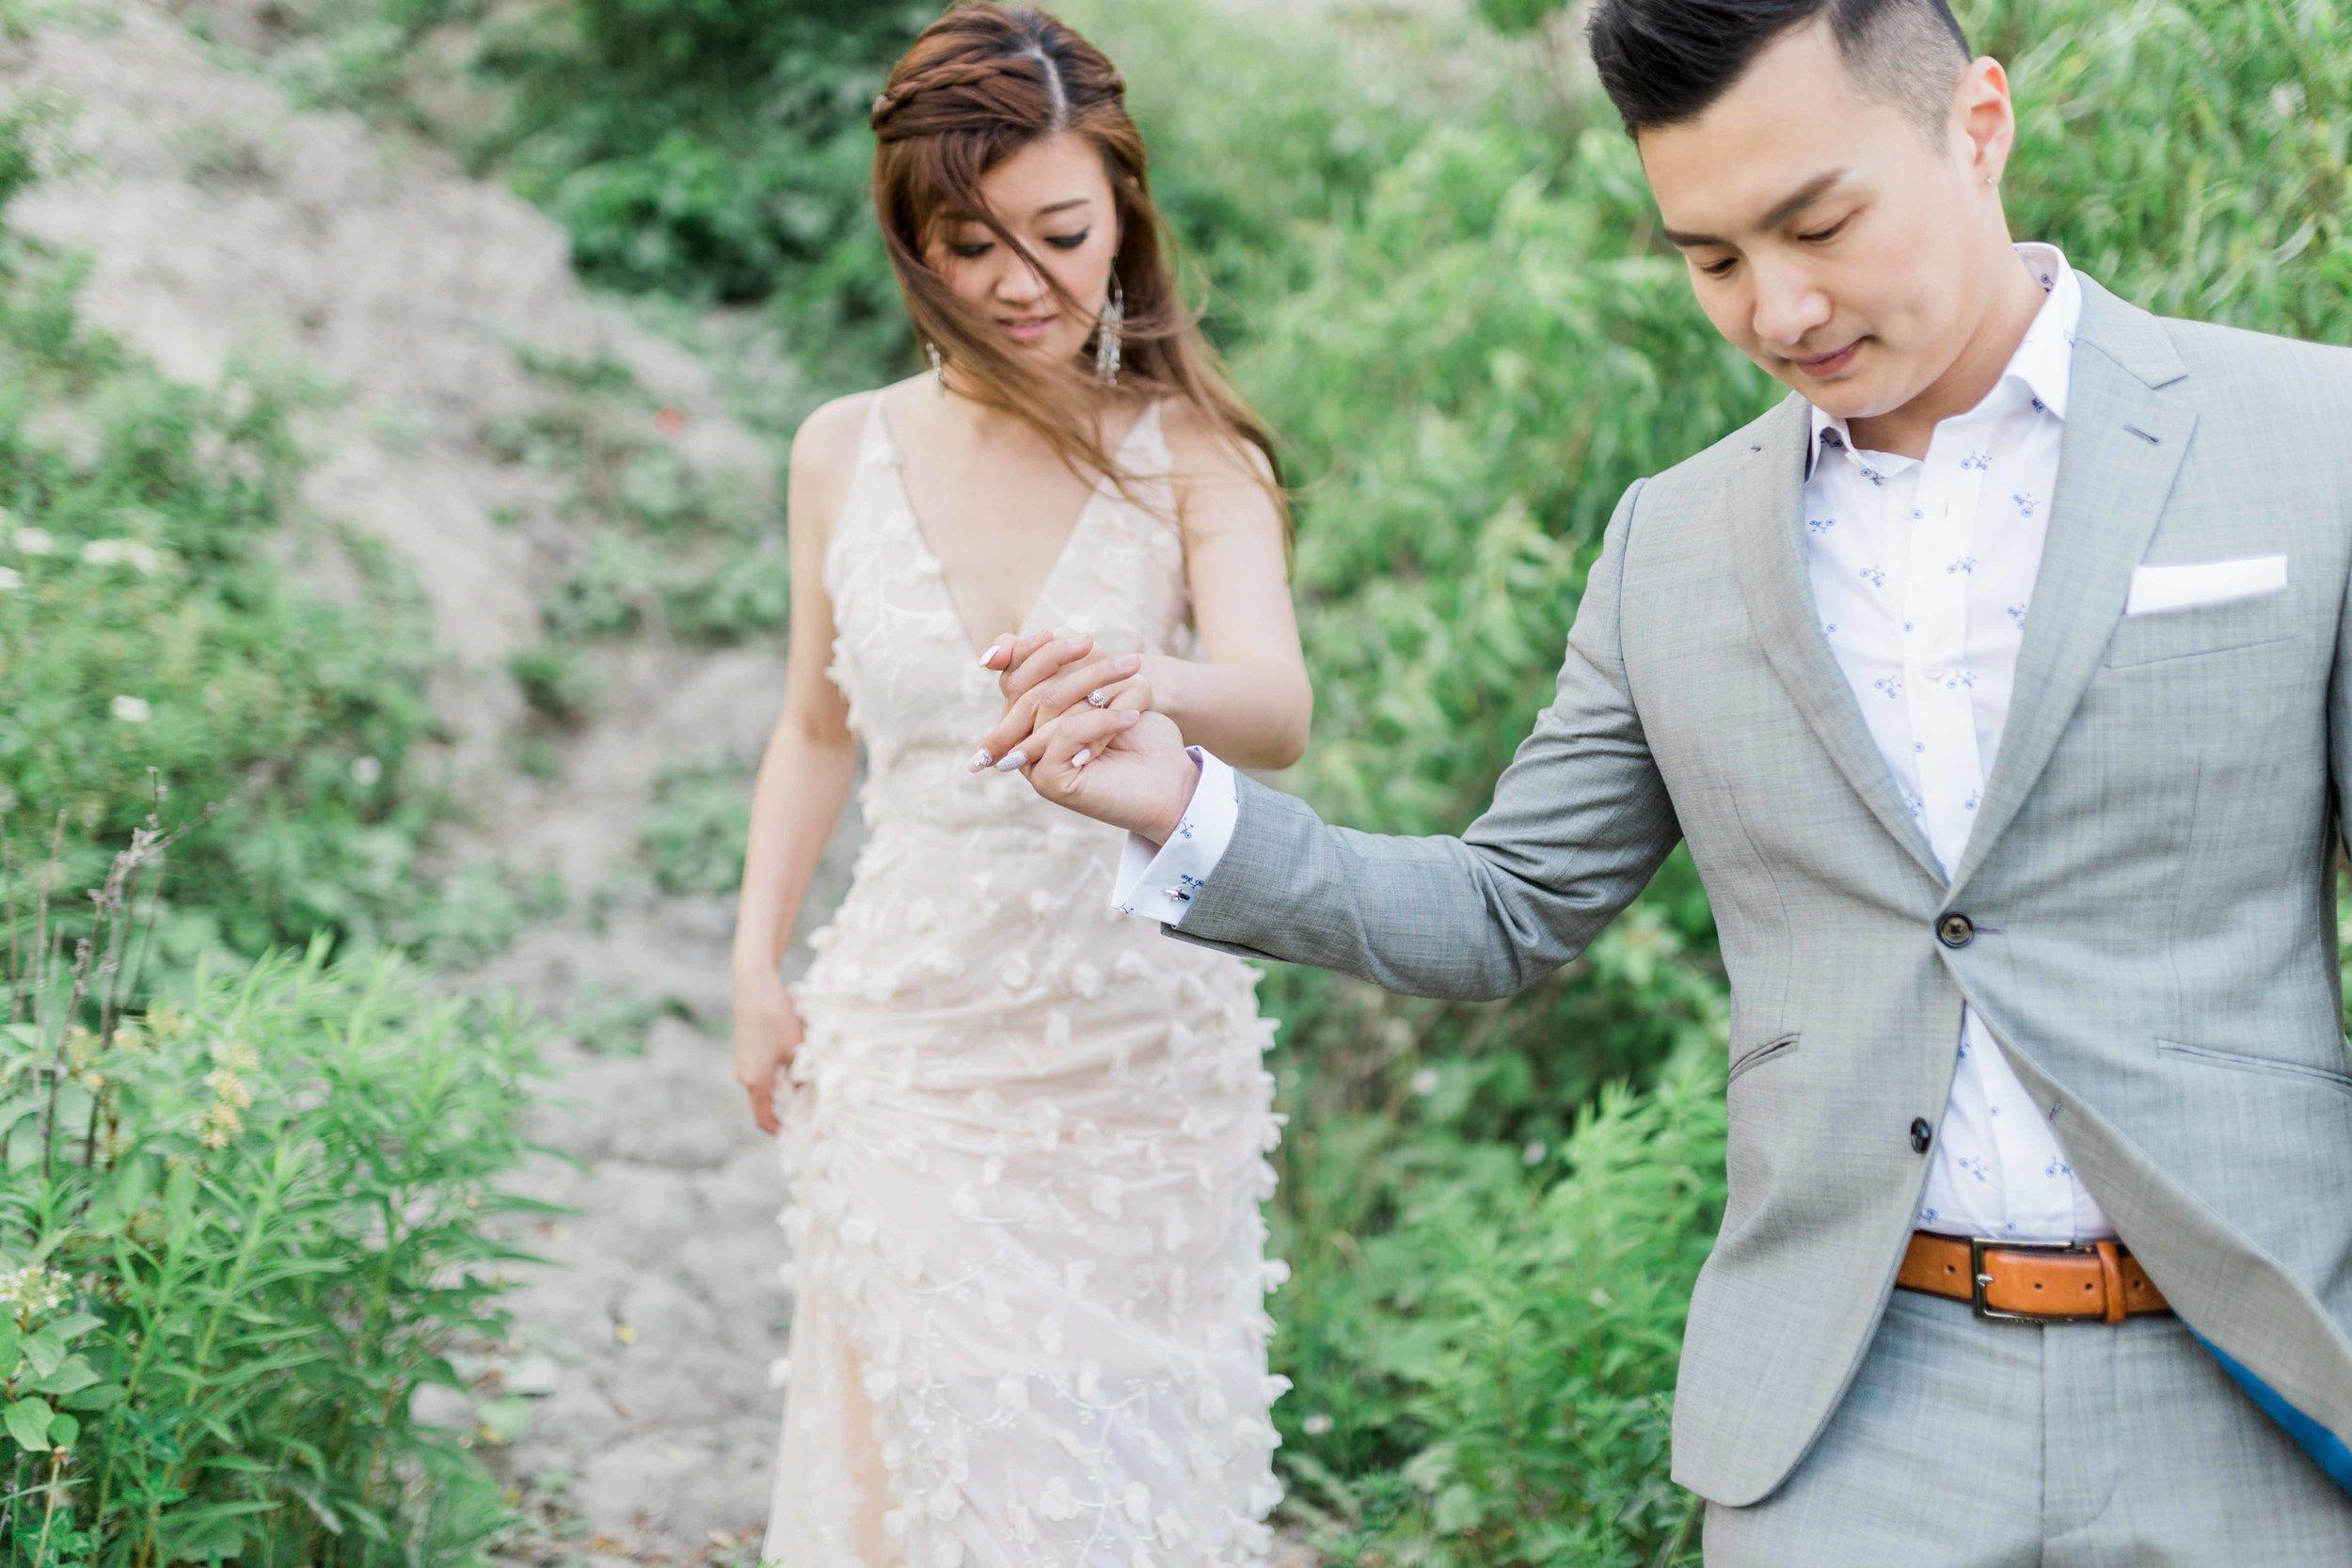 Cari Zhu Fine Art Photographer - Scarborough Bluffs Engagement Session-18.jpg